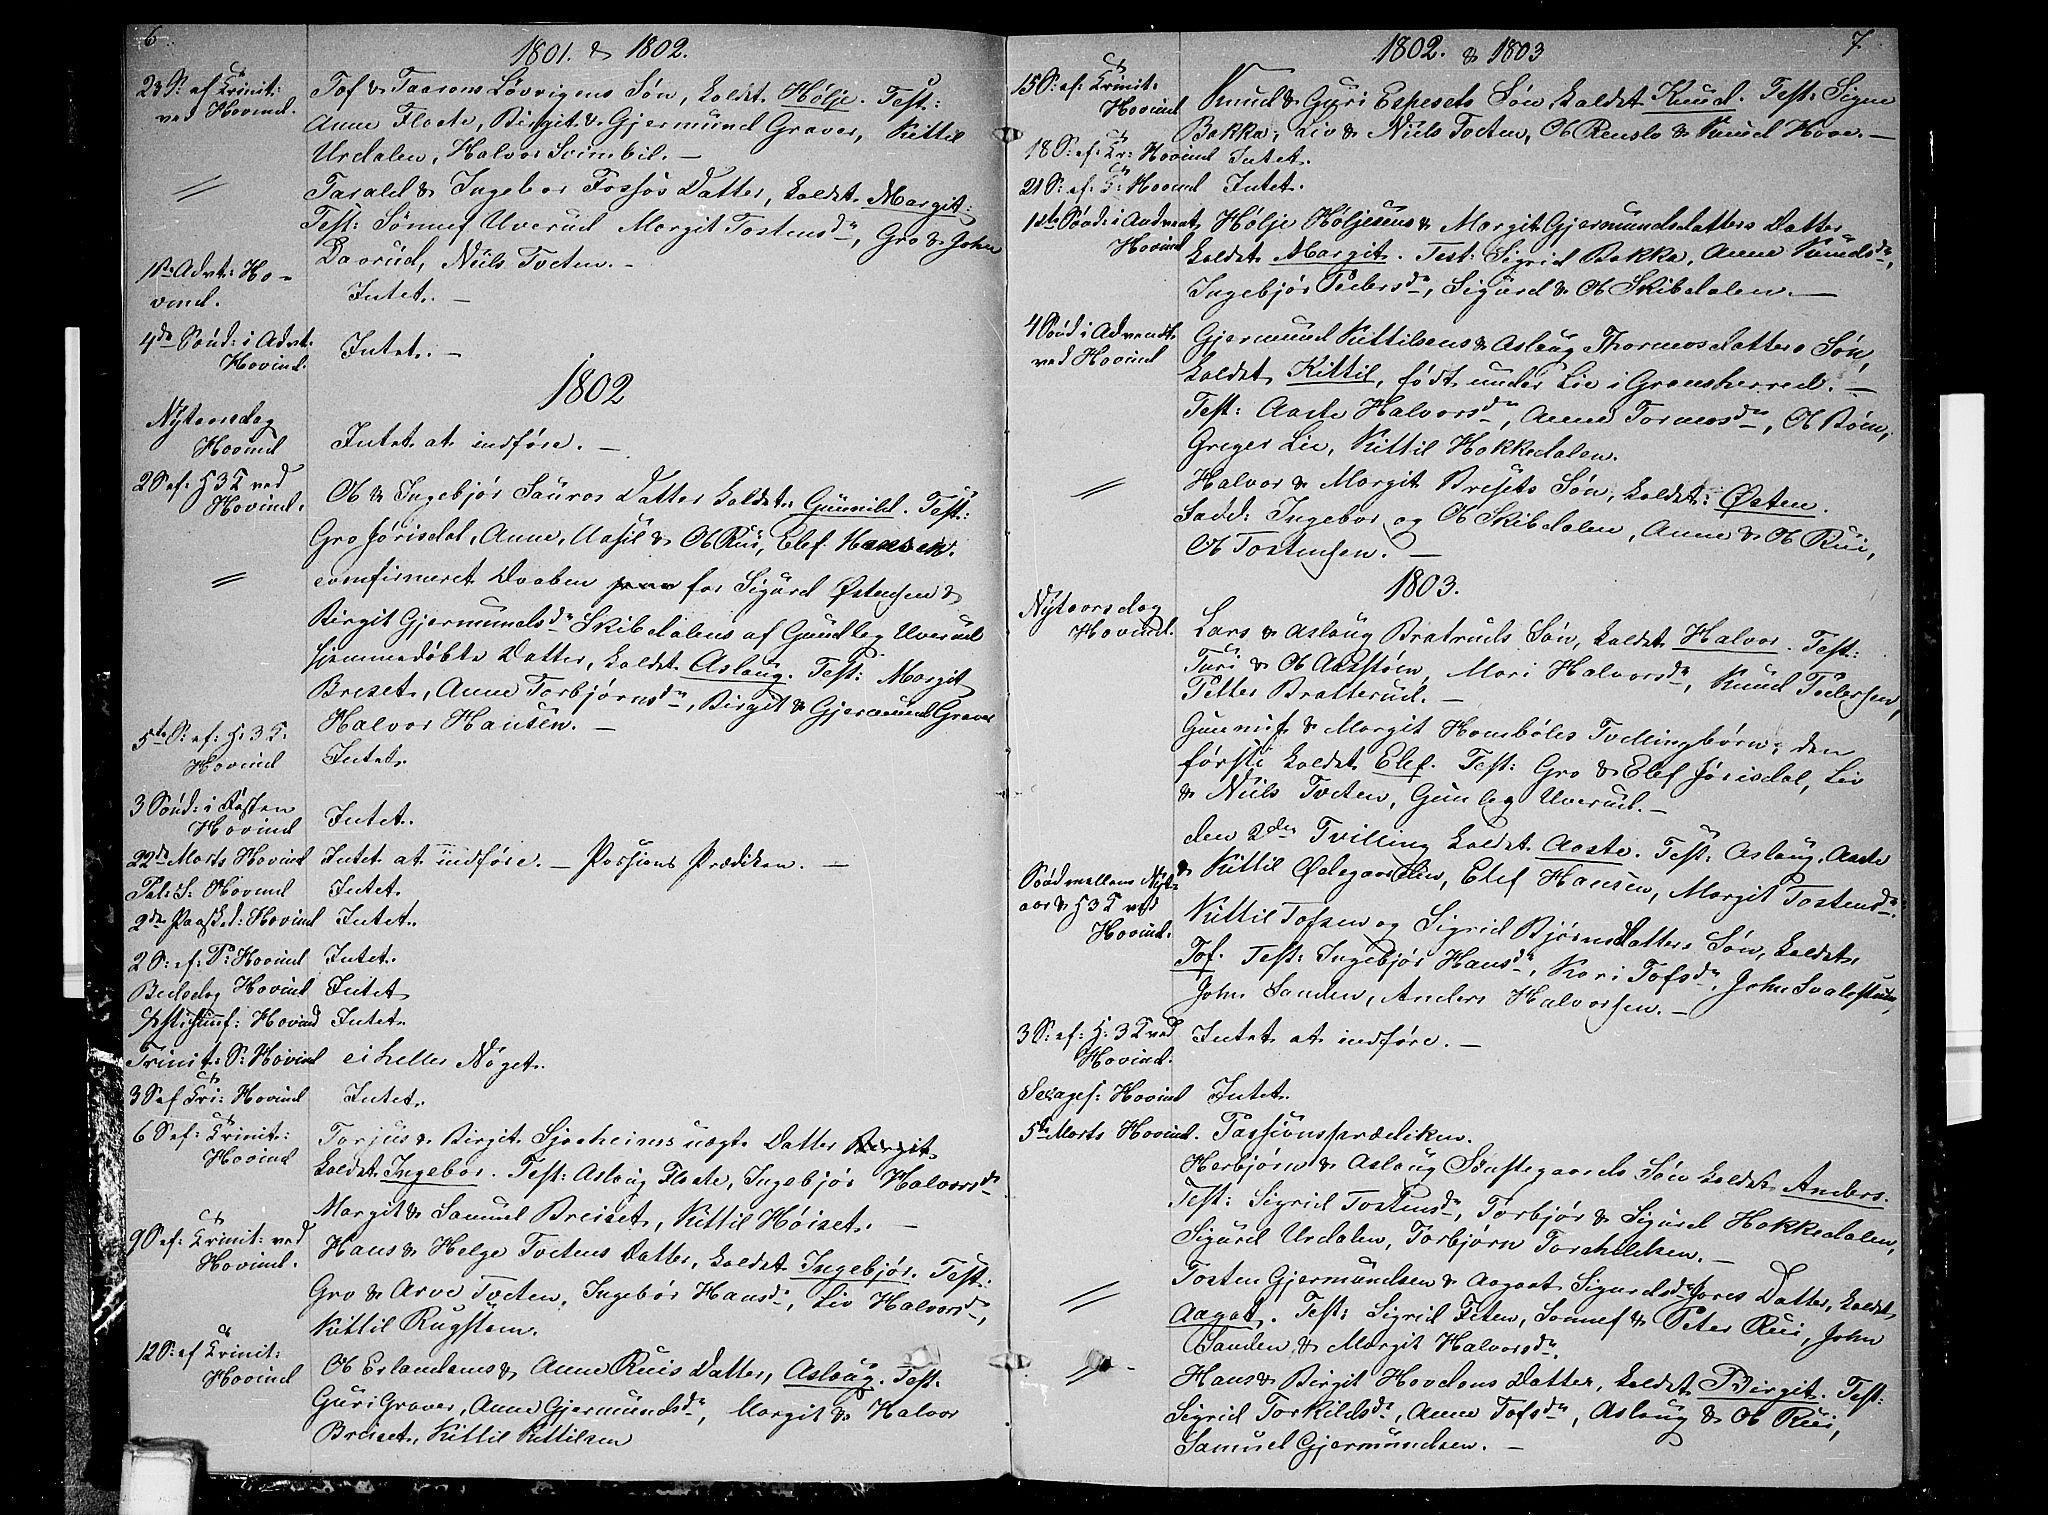 SAKO, Gransherad kirkebøker, F/Fb/L0001: Ministerialbok nr. II 1, 1800-1814, s. 6-7